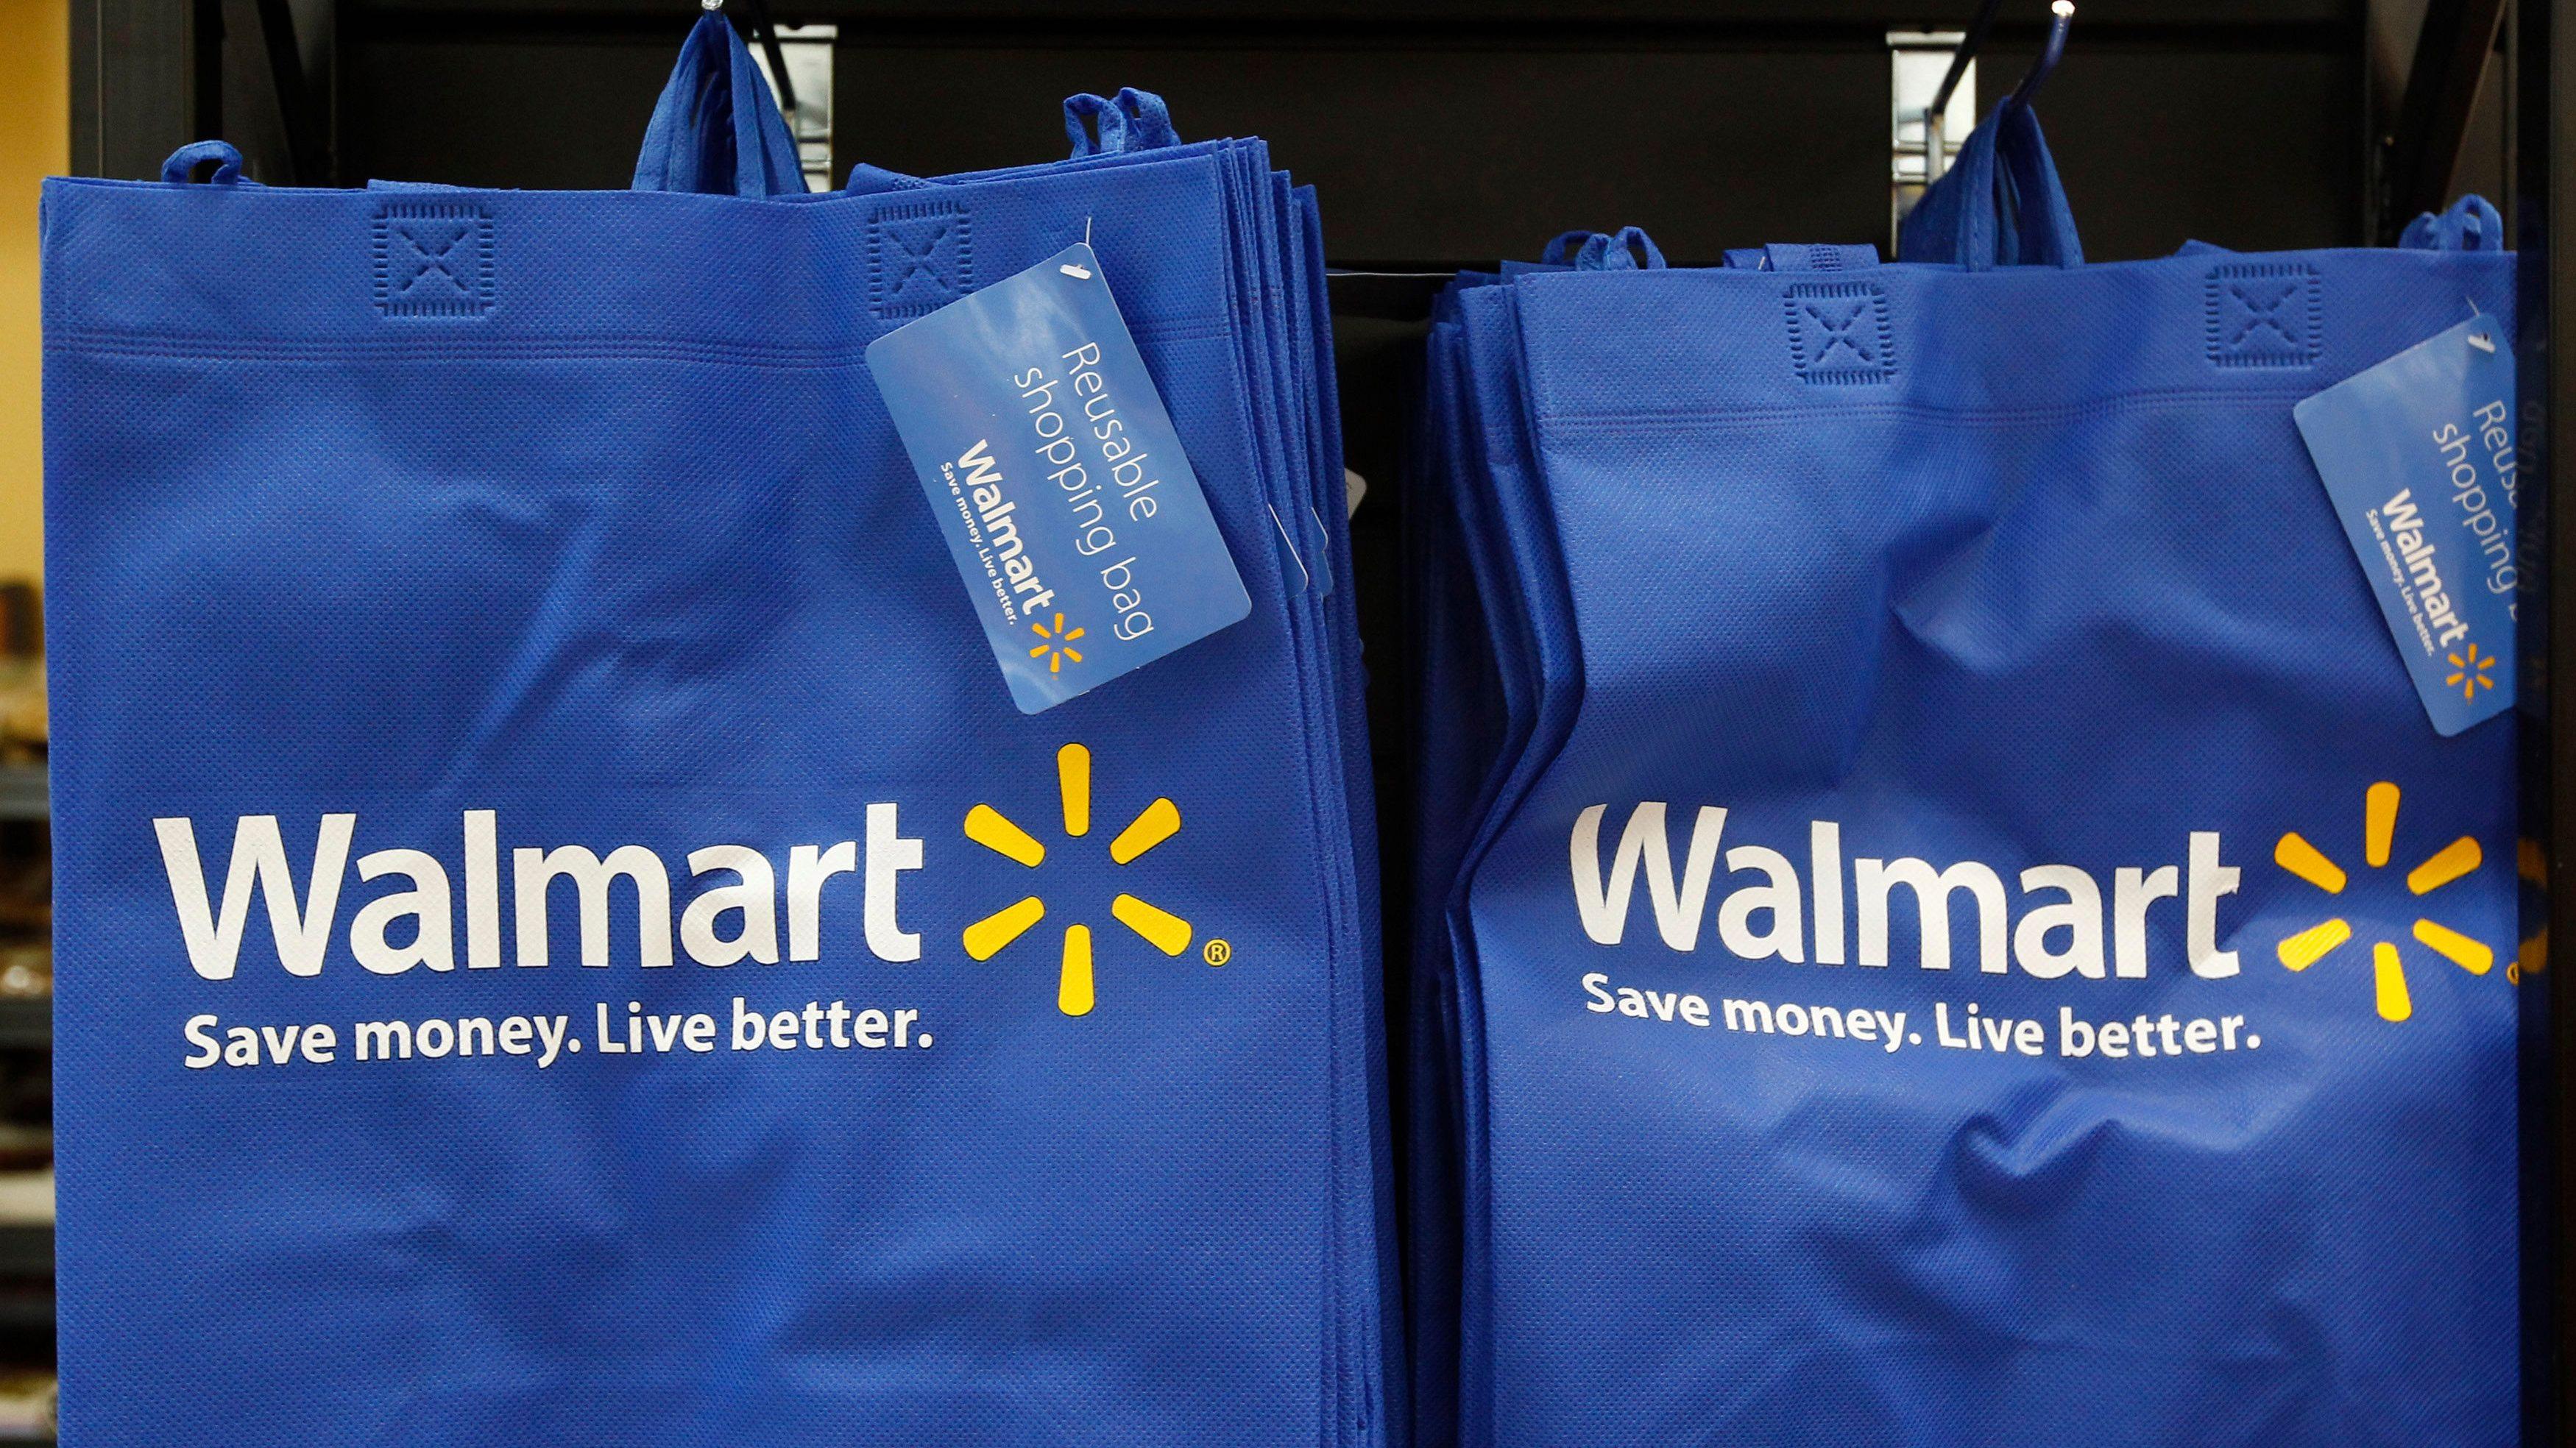 2f70eba867 Walmart says it was prepared for regulatory turbulence when it acquired  Flipkart